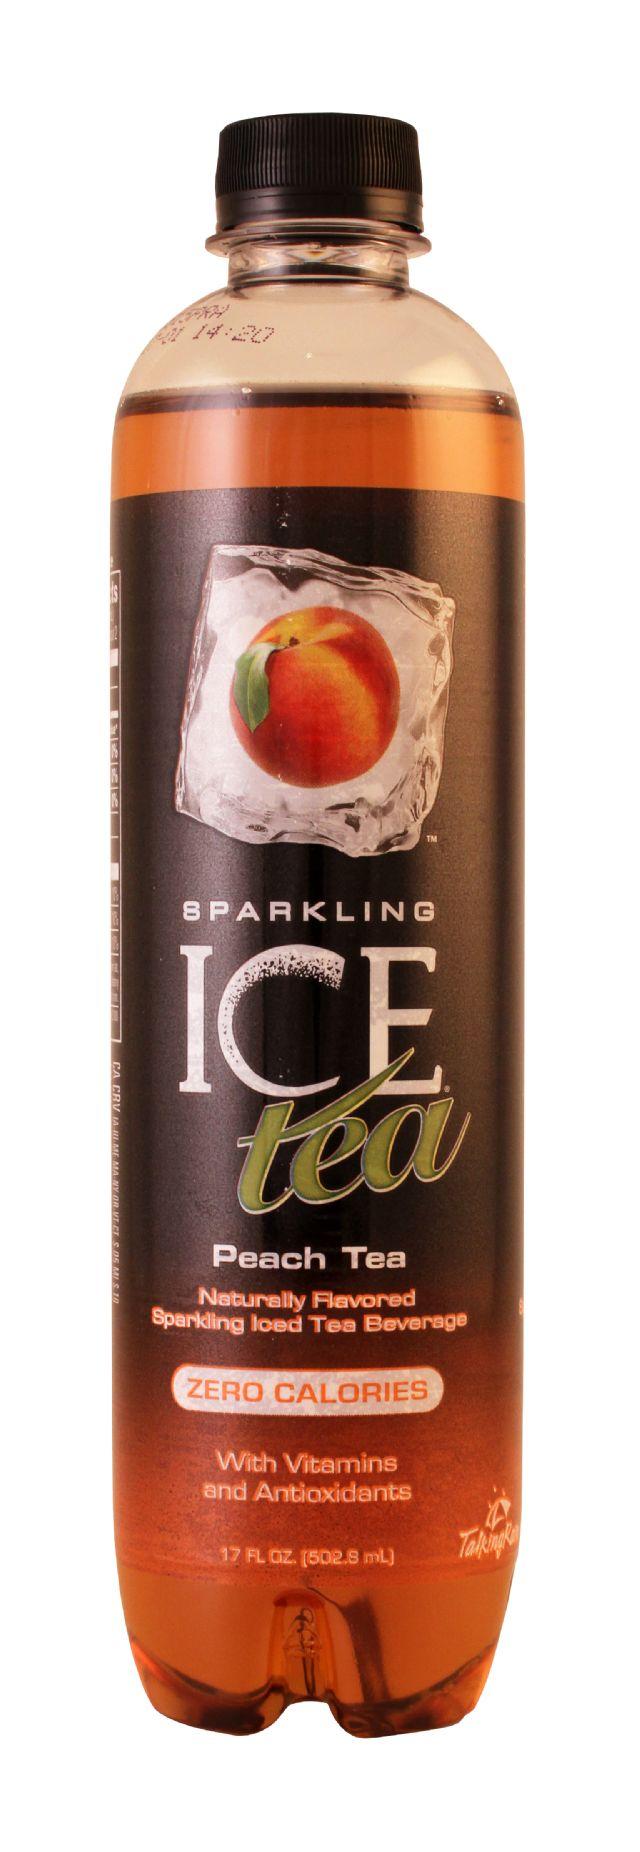 Sparkling Ice -Talking Rain: SparklingICE Tea Peach Front